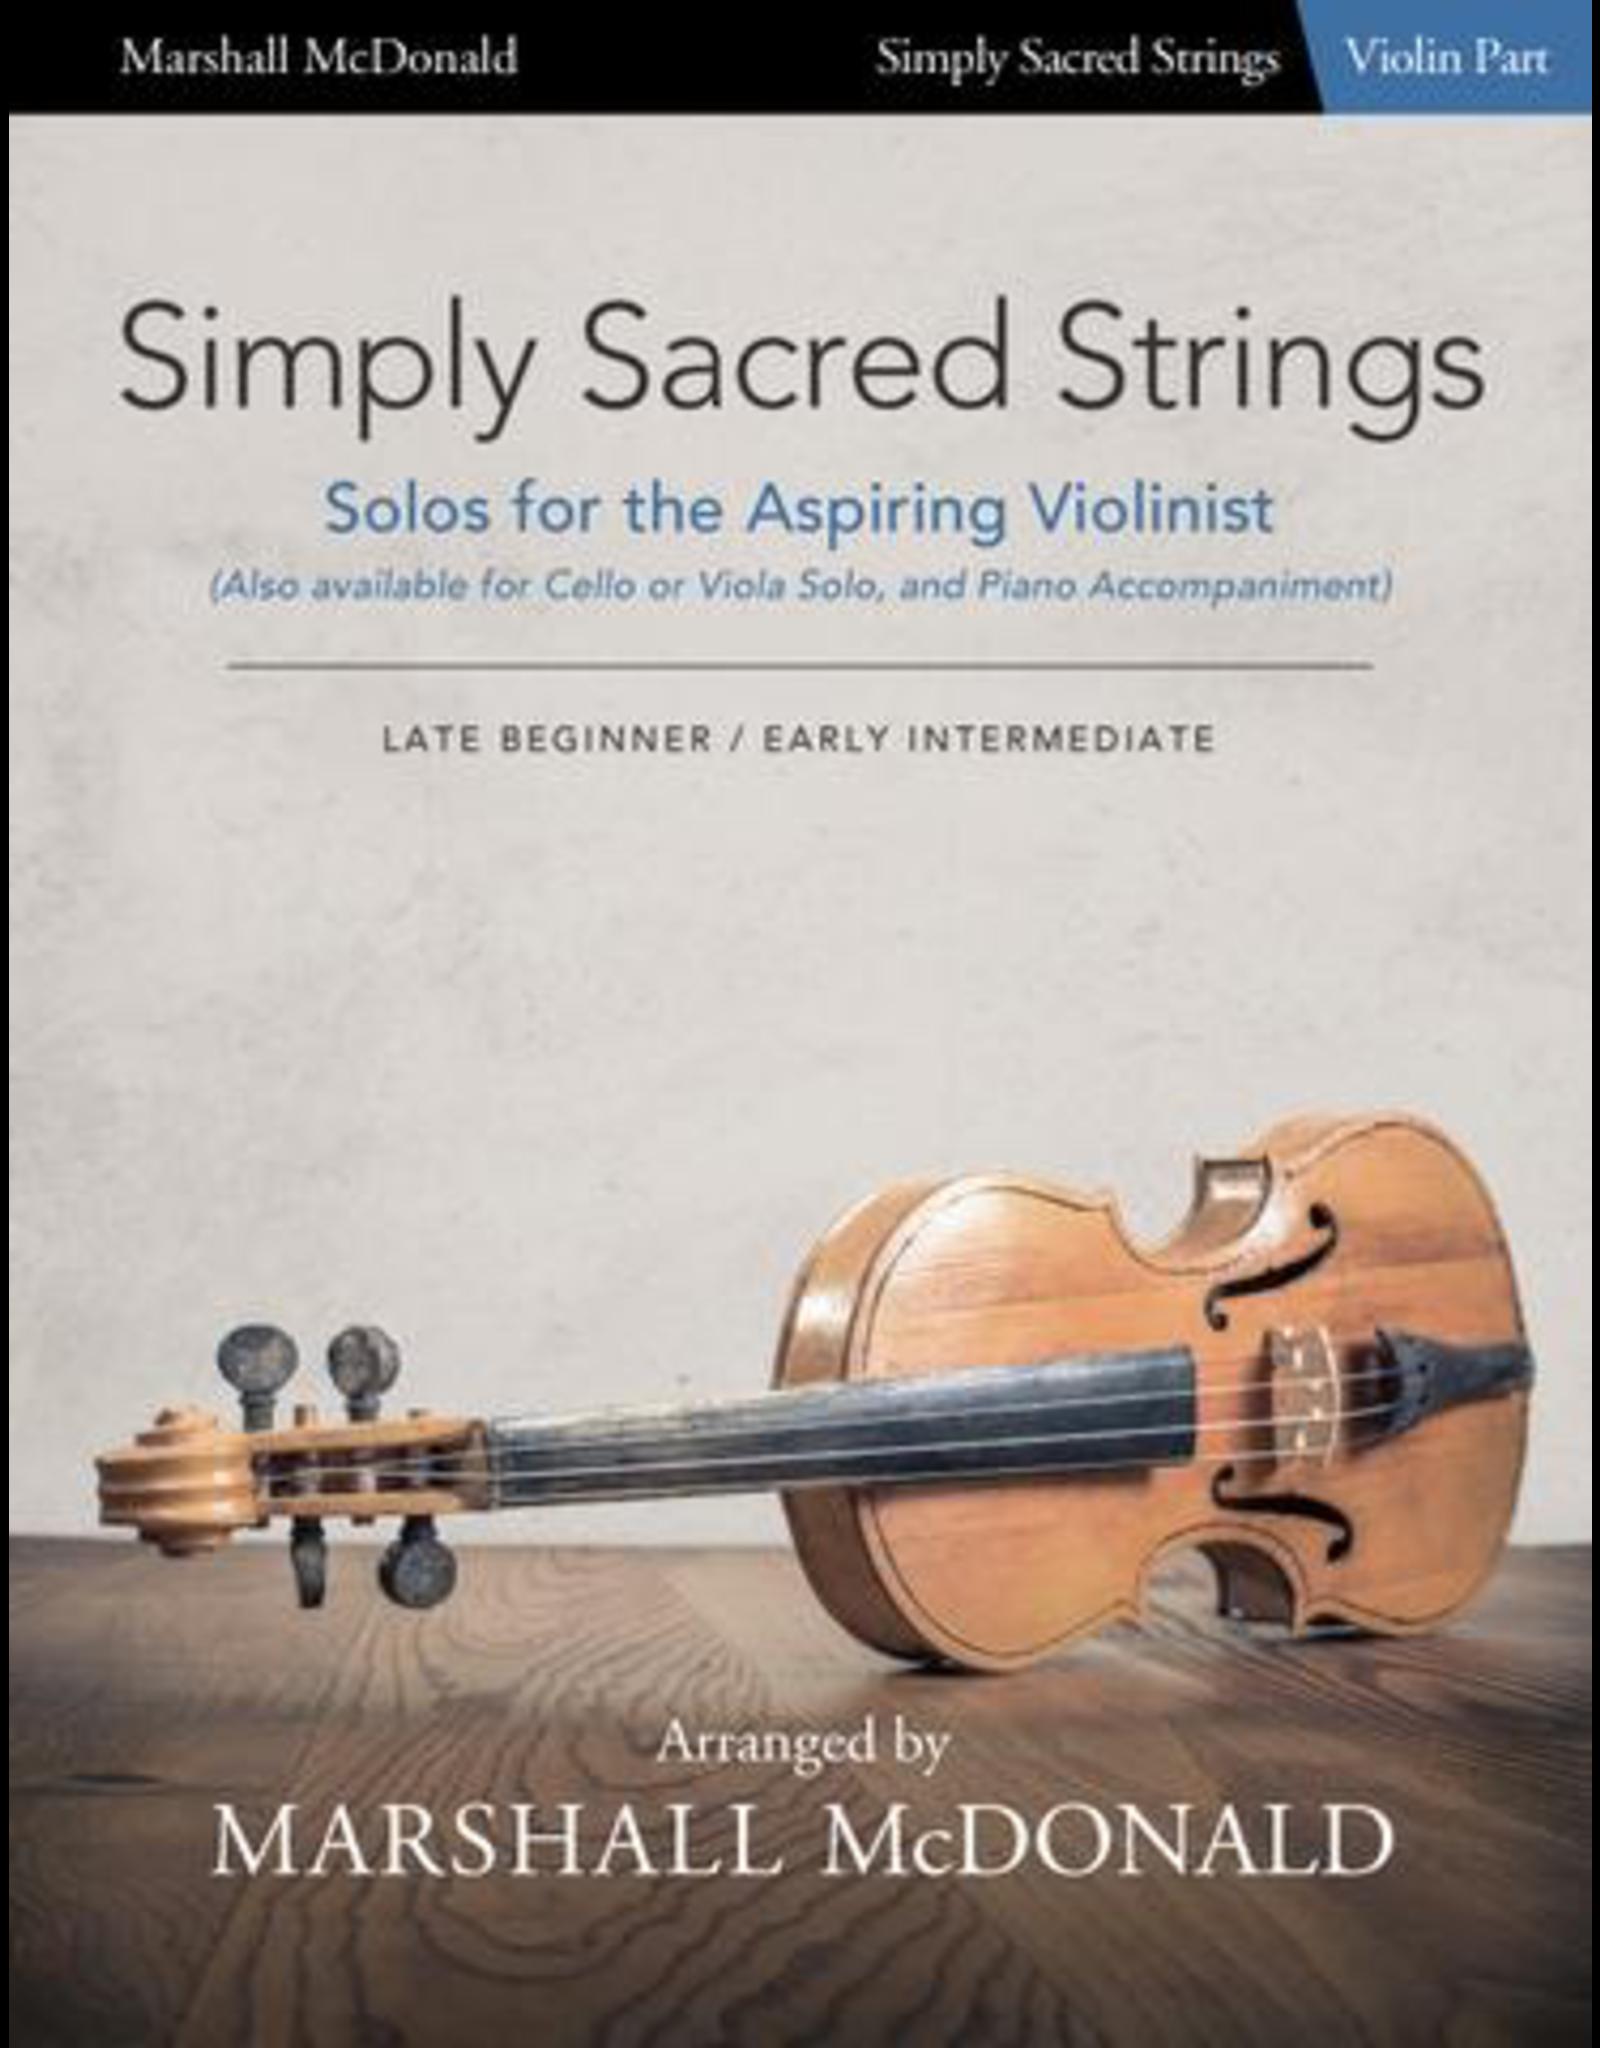 Marshall McDonald Music Simply Sacred Strings by Marshall McDonald - Violin Booklet